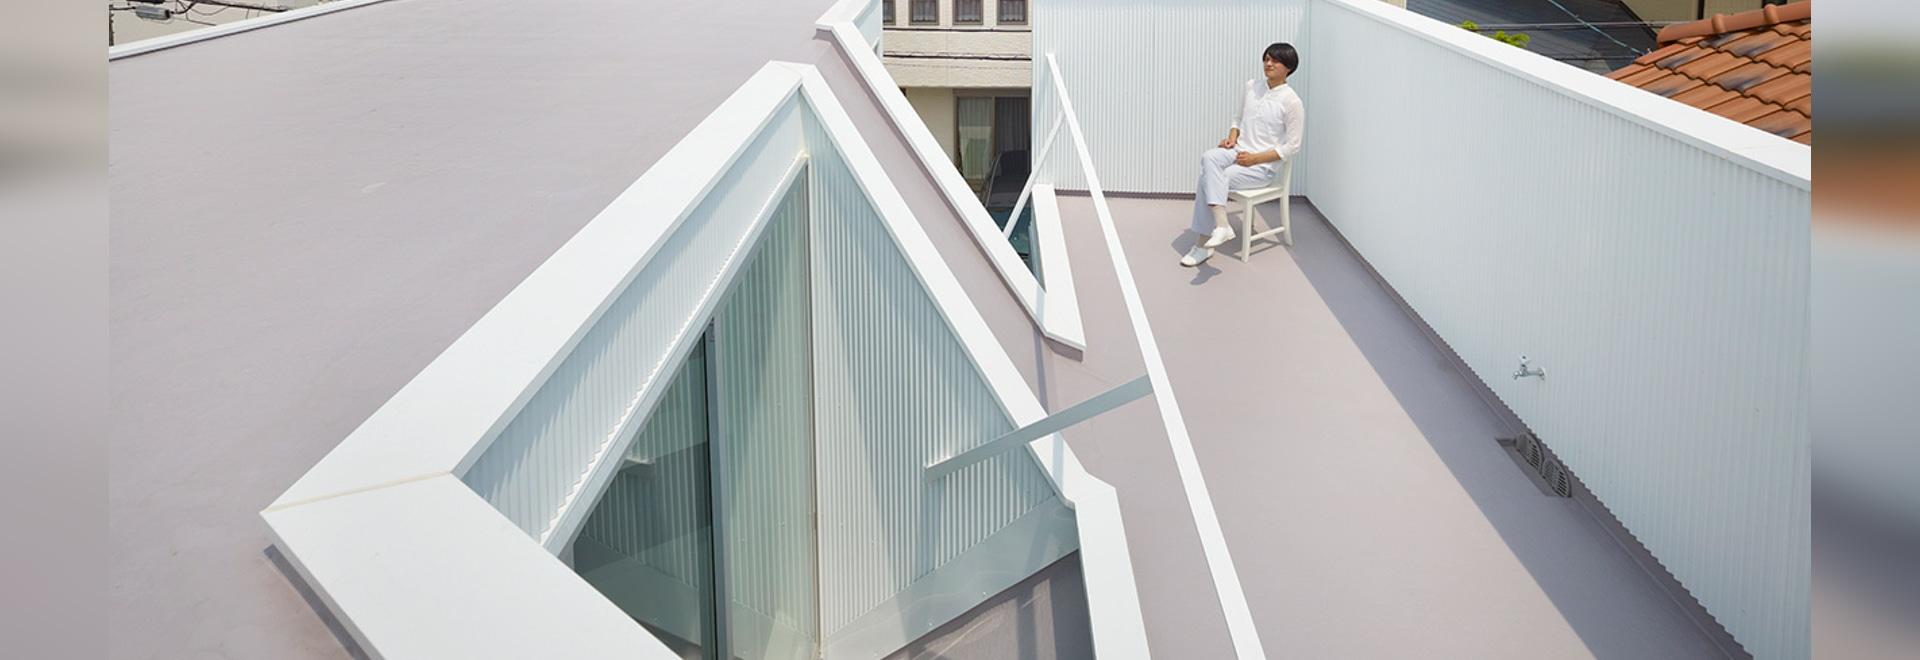 Koyasan Guest House by Alphaville Architects, Wakayama, Japan, 2012